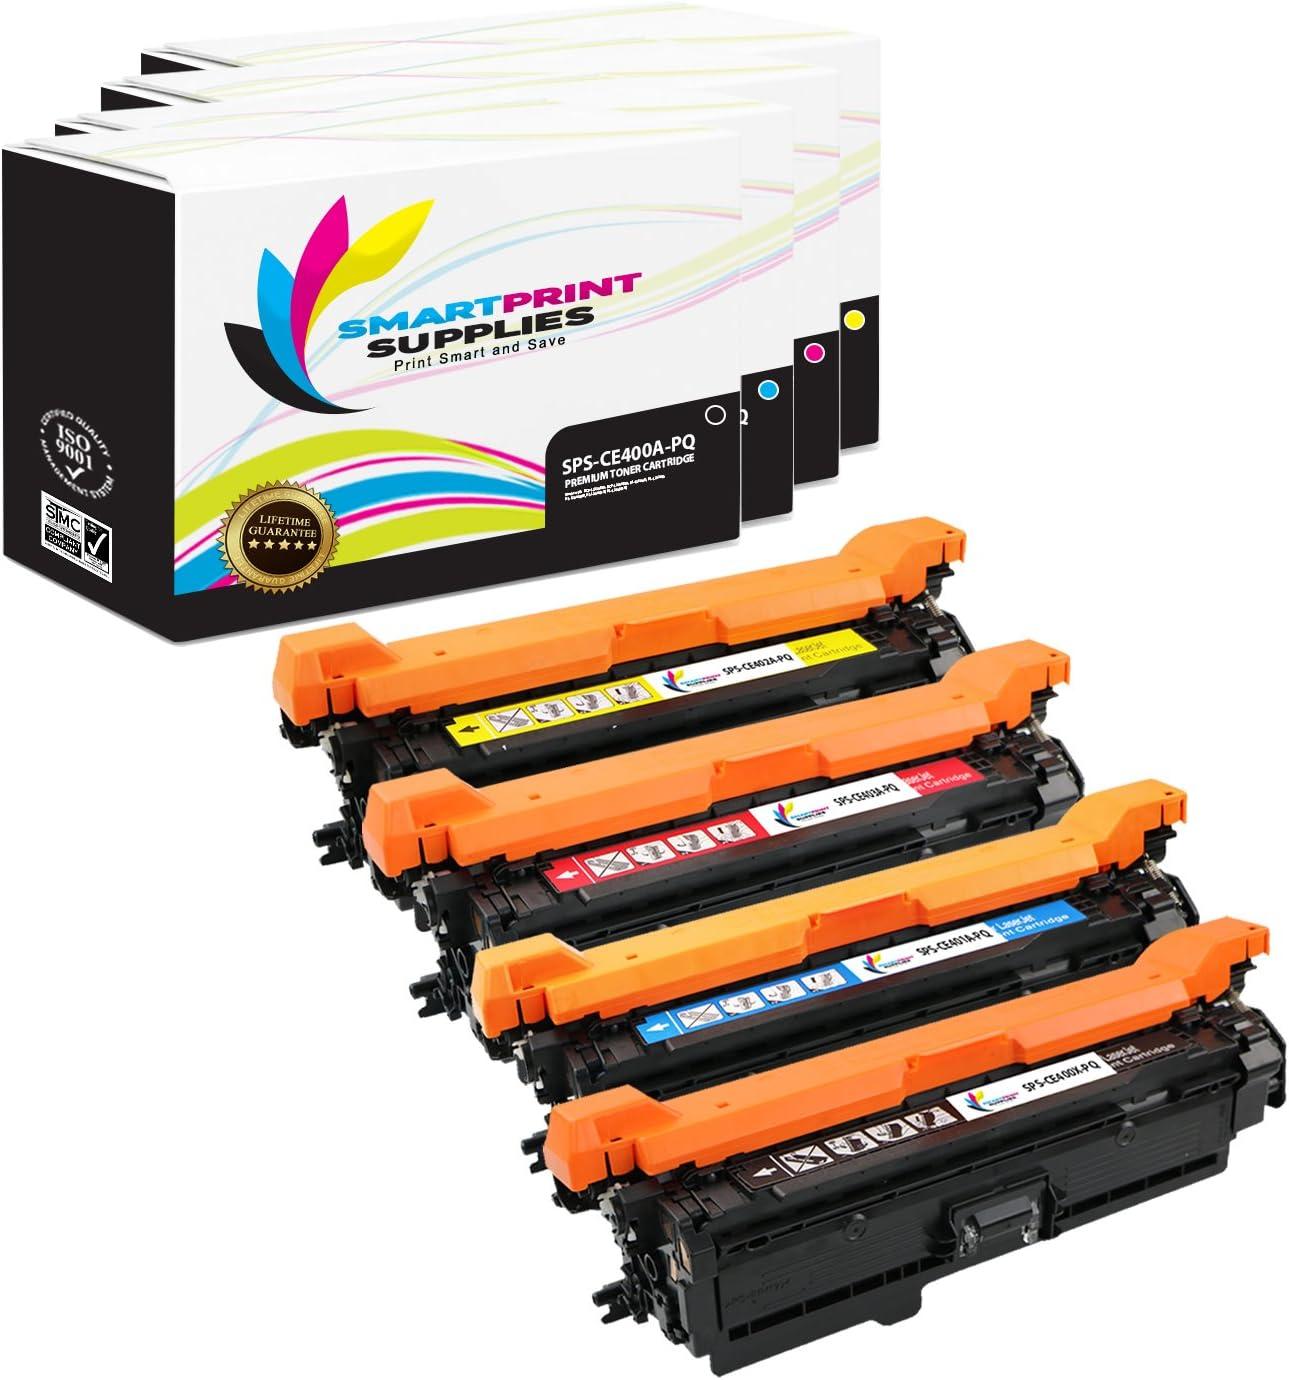 4 Pack Smart Print Supplies Compatible 507A 507X CE400X CE401A CE402A CE403A Premium Toner Cartridge Replacement for HP Laserjet M551 M551dn M551n M551xh Printers Black, Cyan, Magenta, Yellow